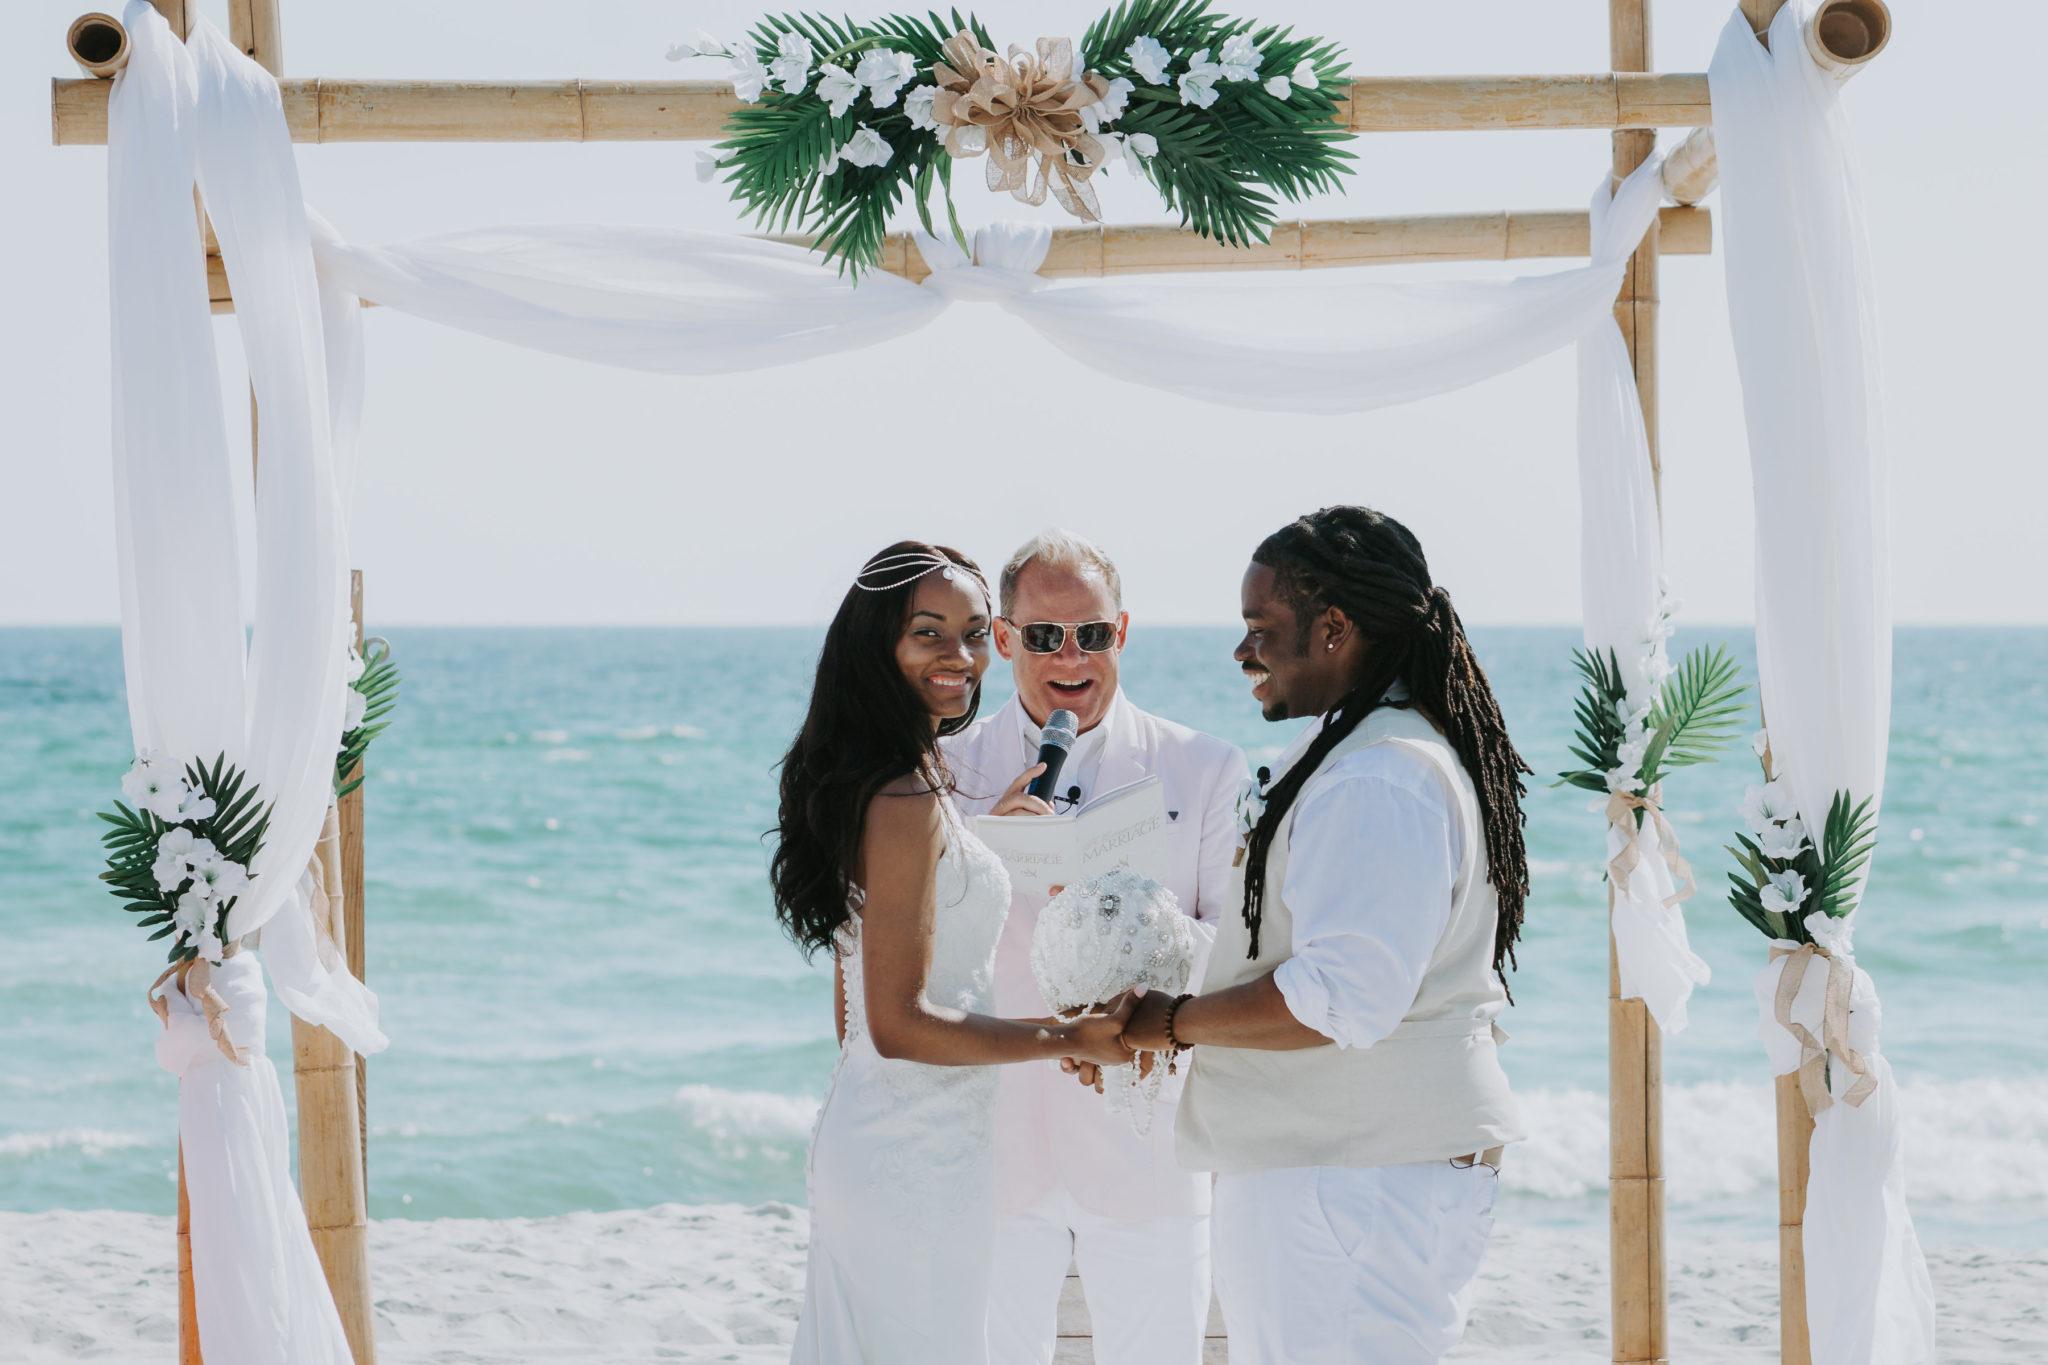 ffe43317ad Panama City Beach Weddings & Accommodations - By The Sea Resorts